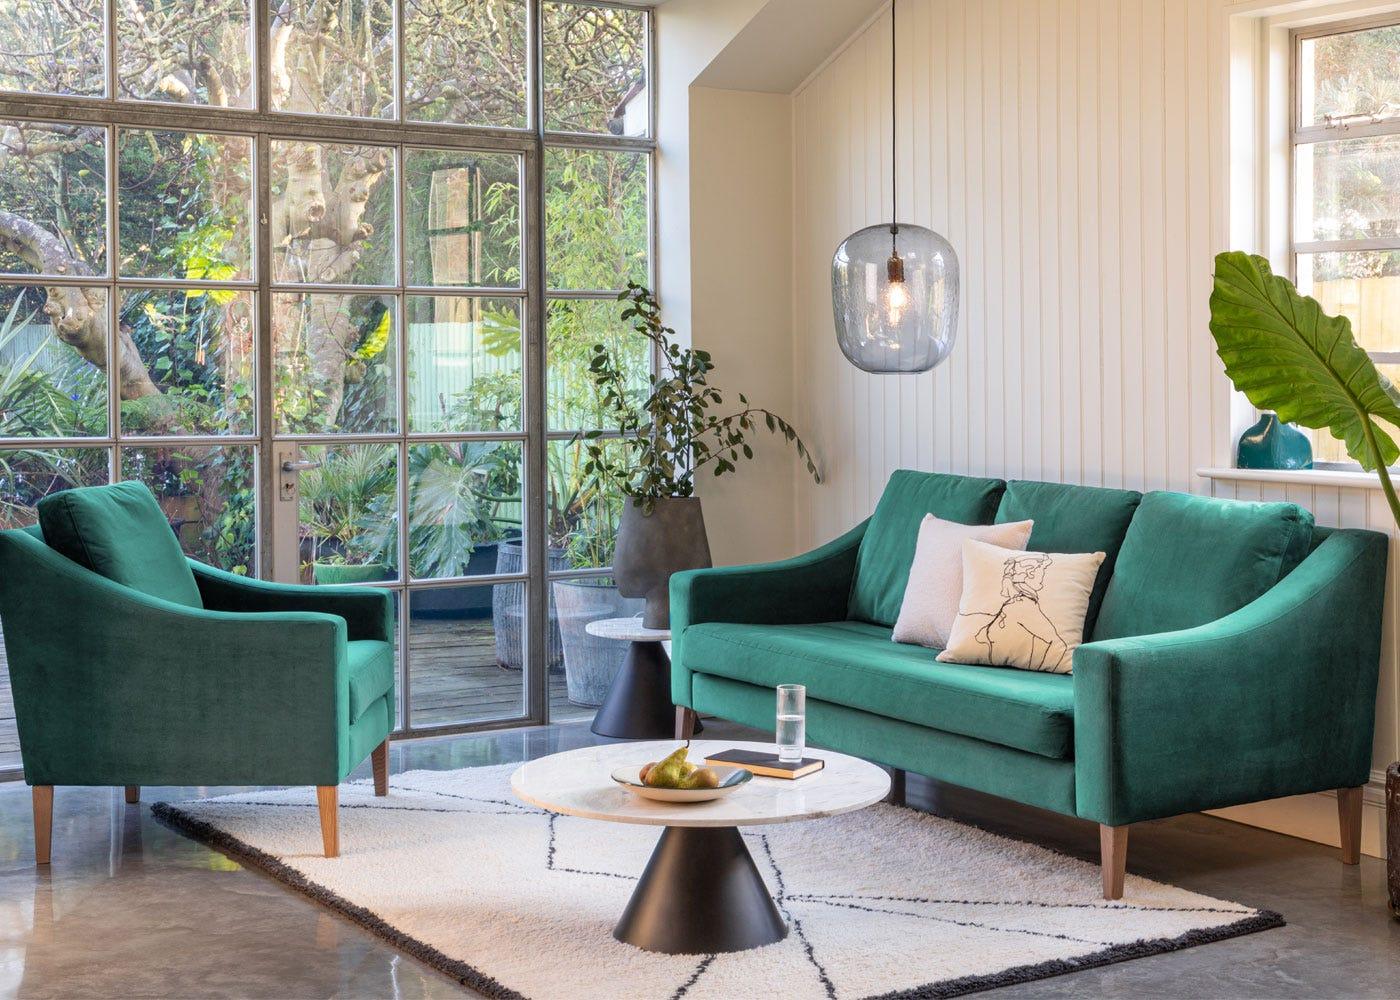 Cezanne Circular Coffee Table Marble. Richmond 3 seater sofa